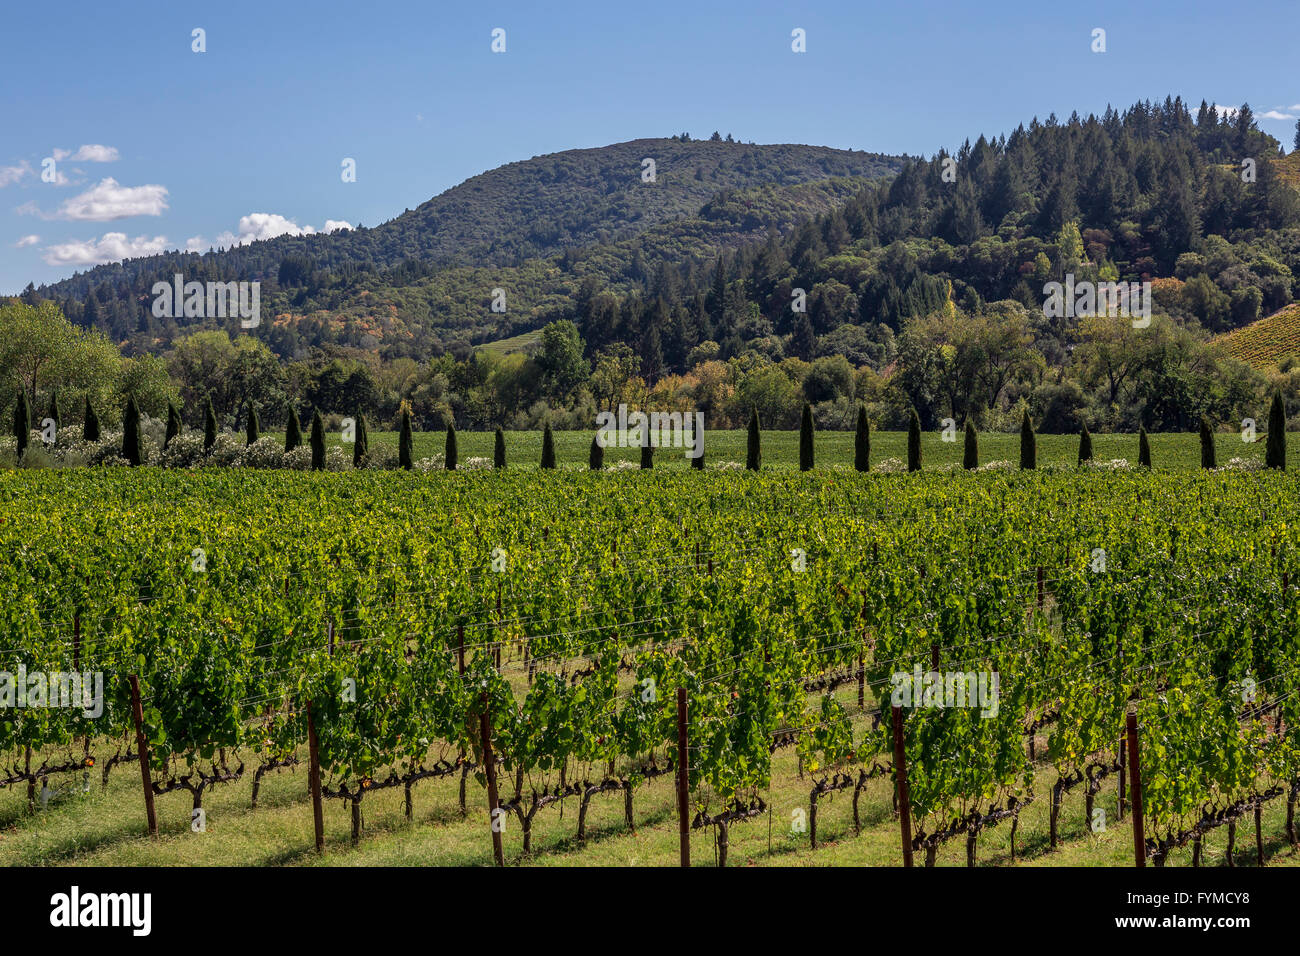 grape vineyard, grape vineyards, vineyard, vineyards